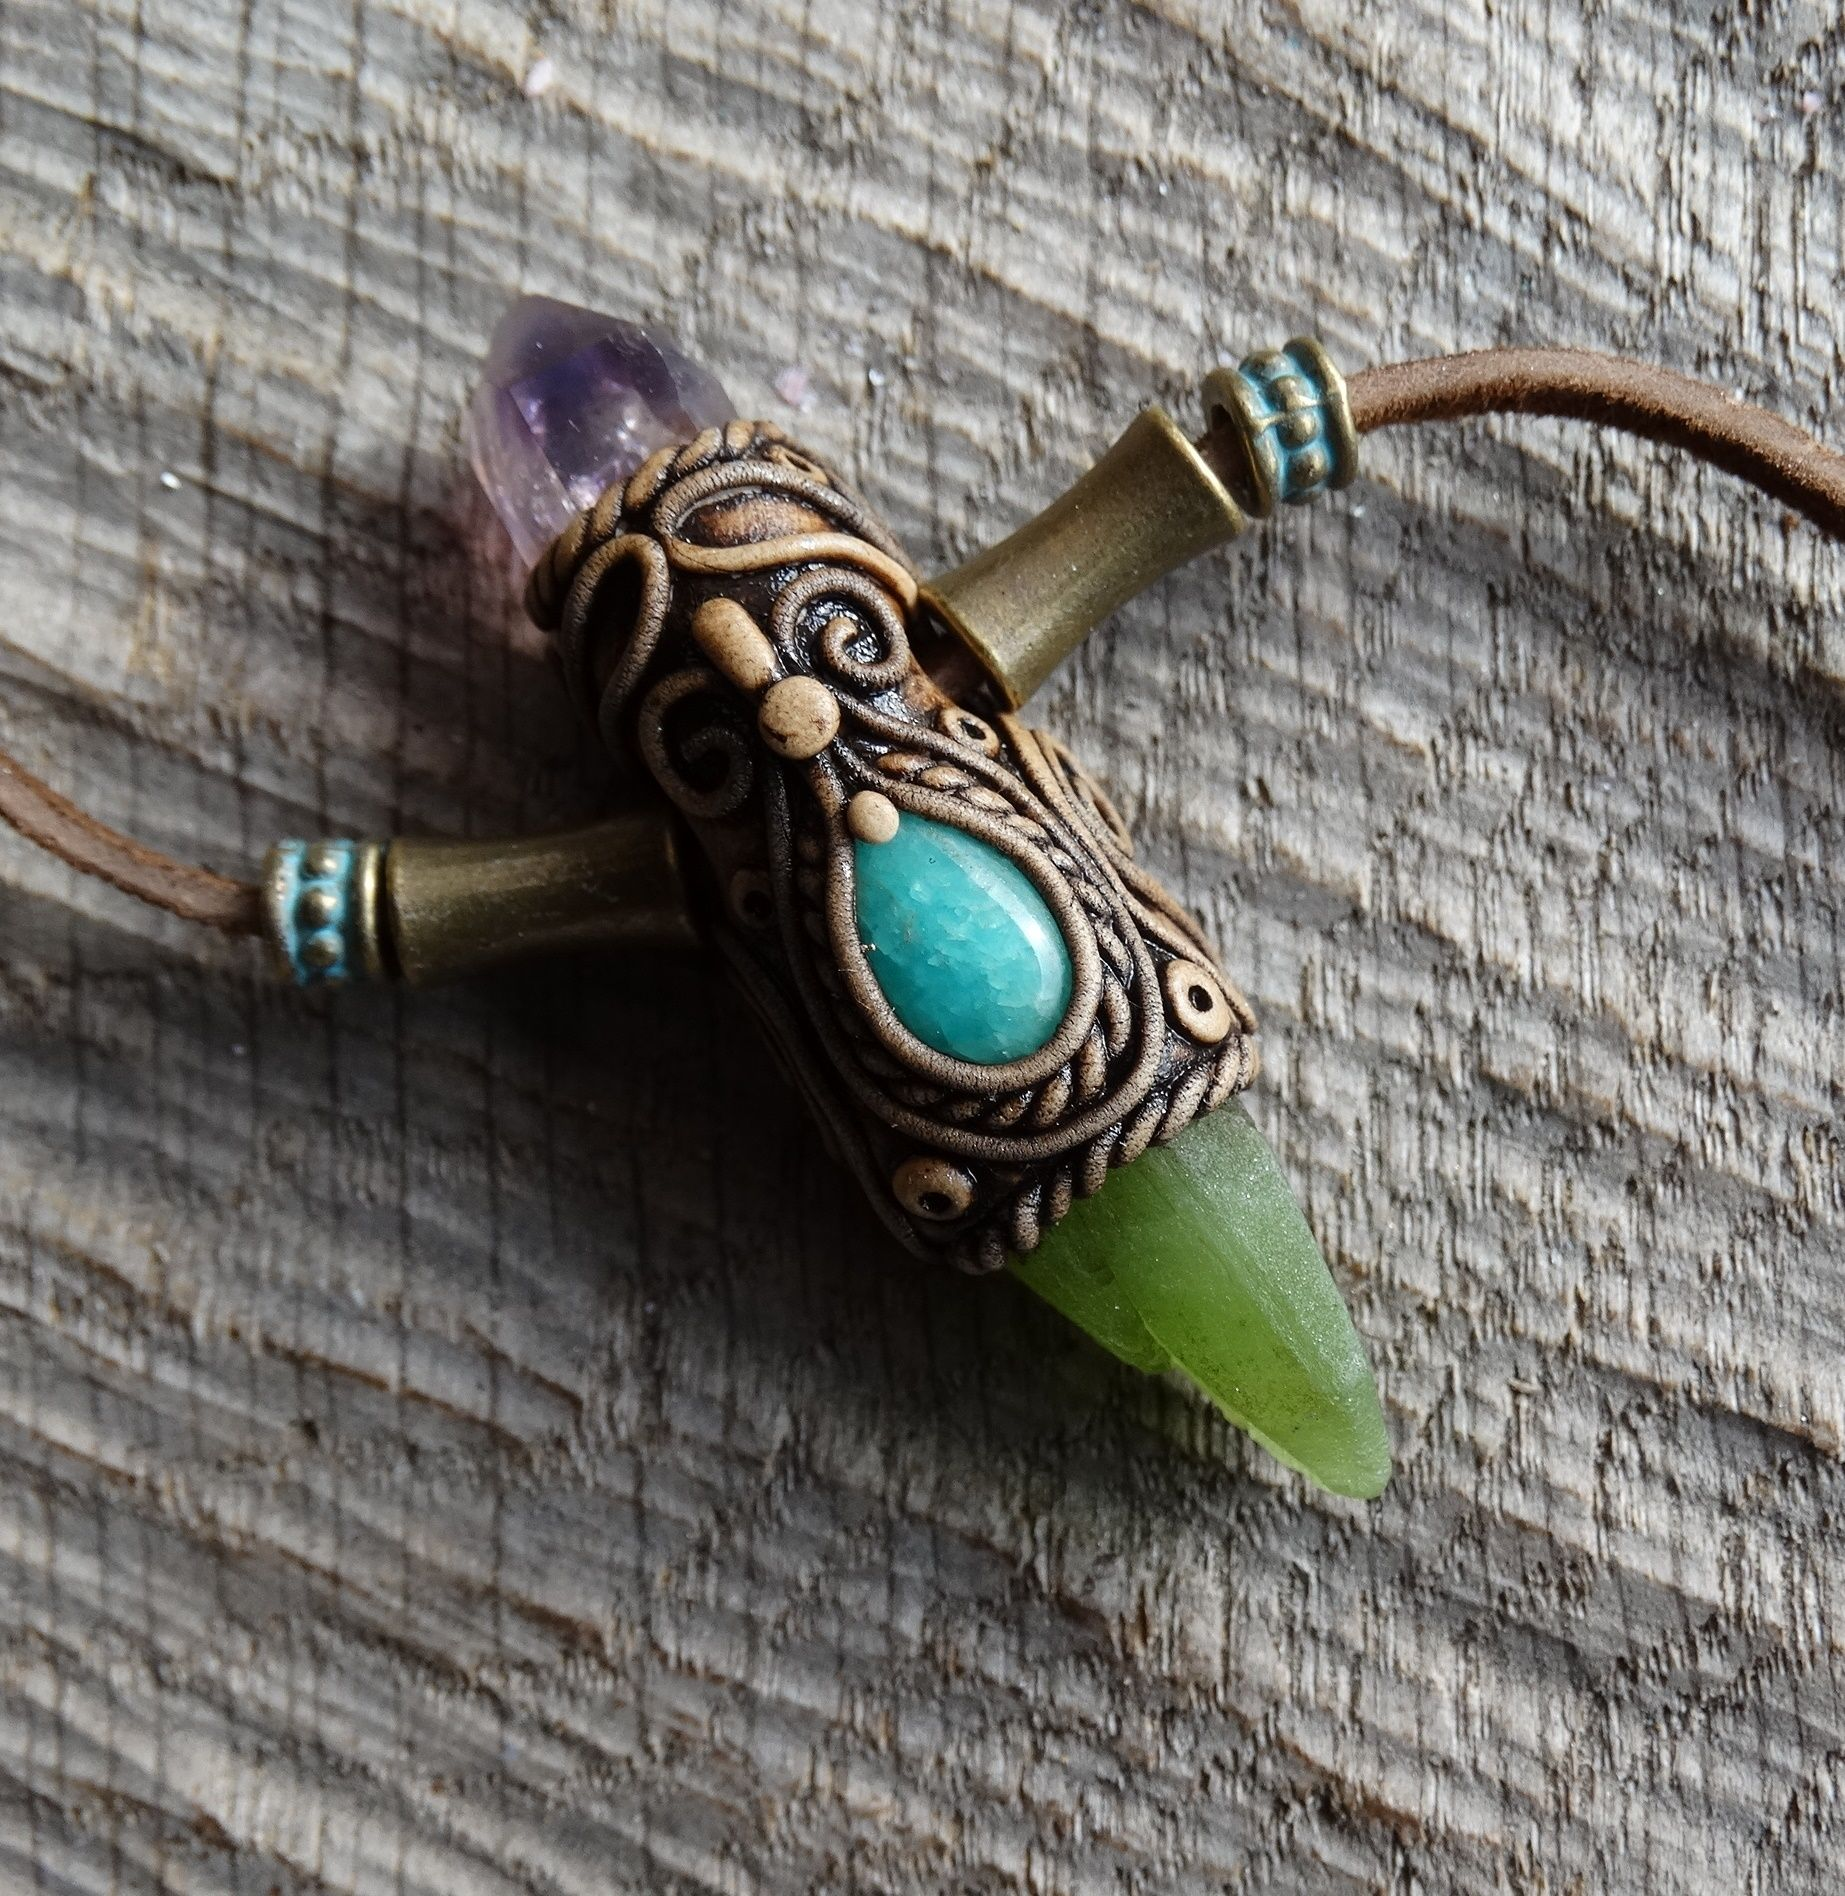 Brandberg Amethyst Pendant Terminated natural Peridot Necklace